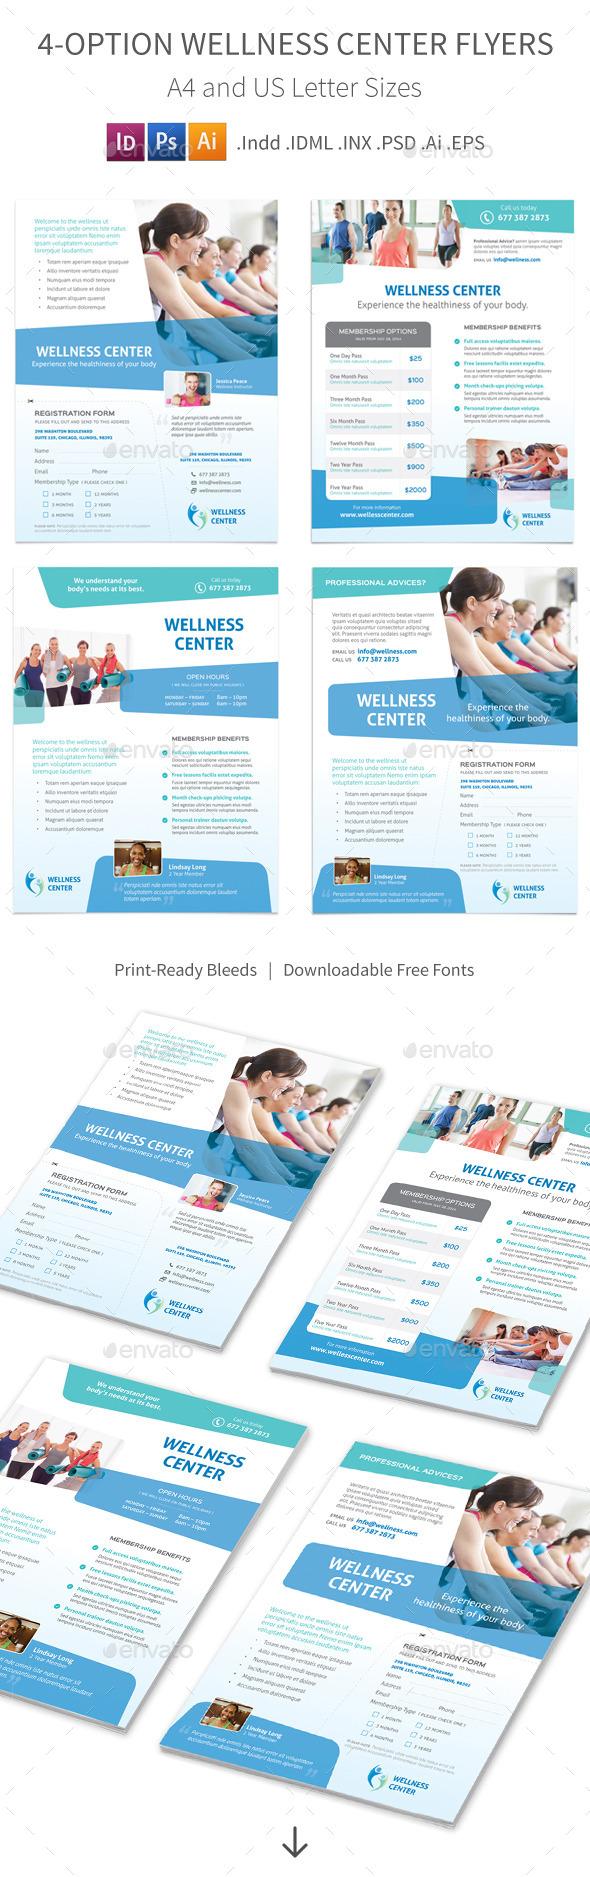 GraphicRiver Wellness Center Flyers 4 Options 8900971